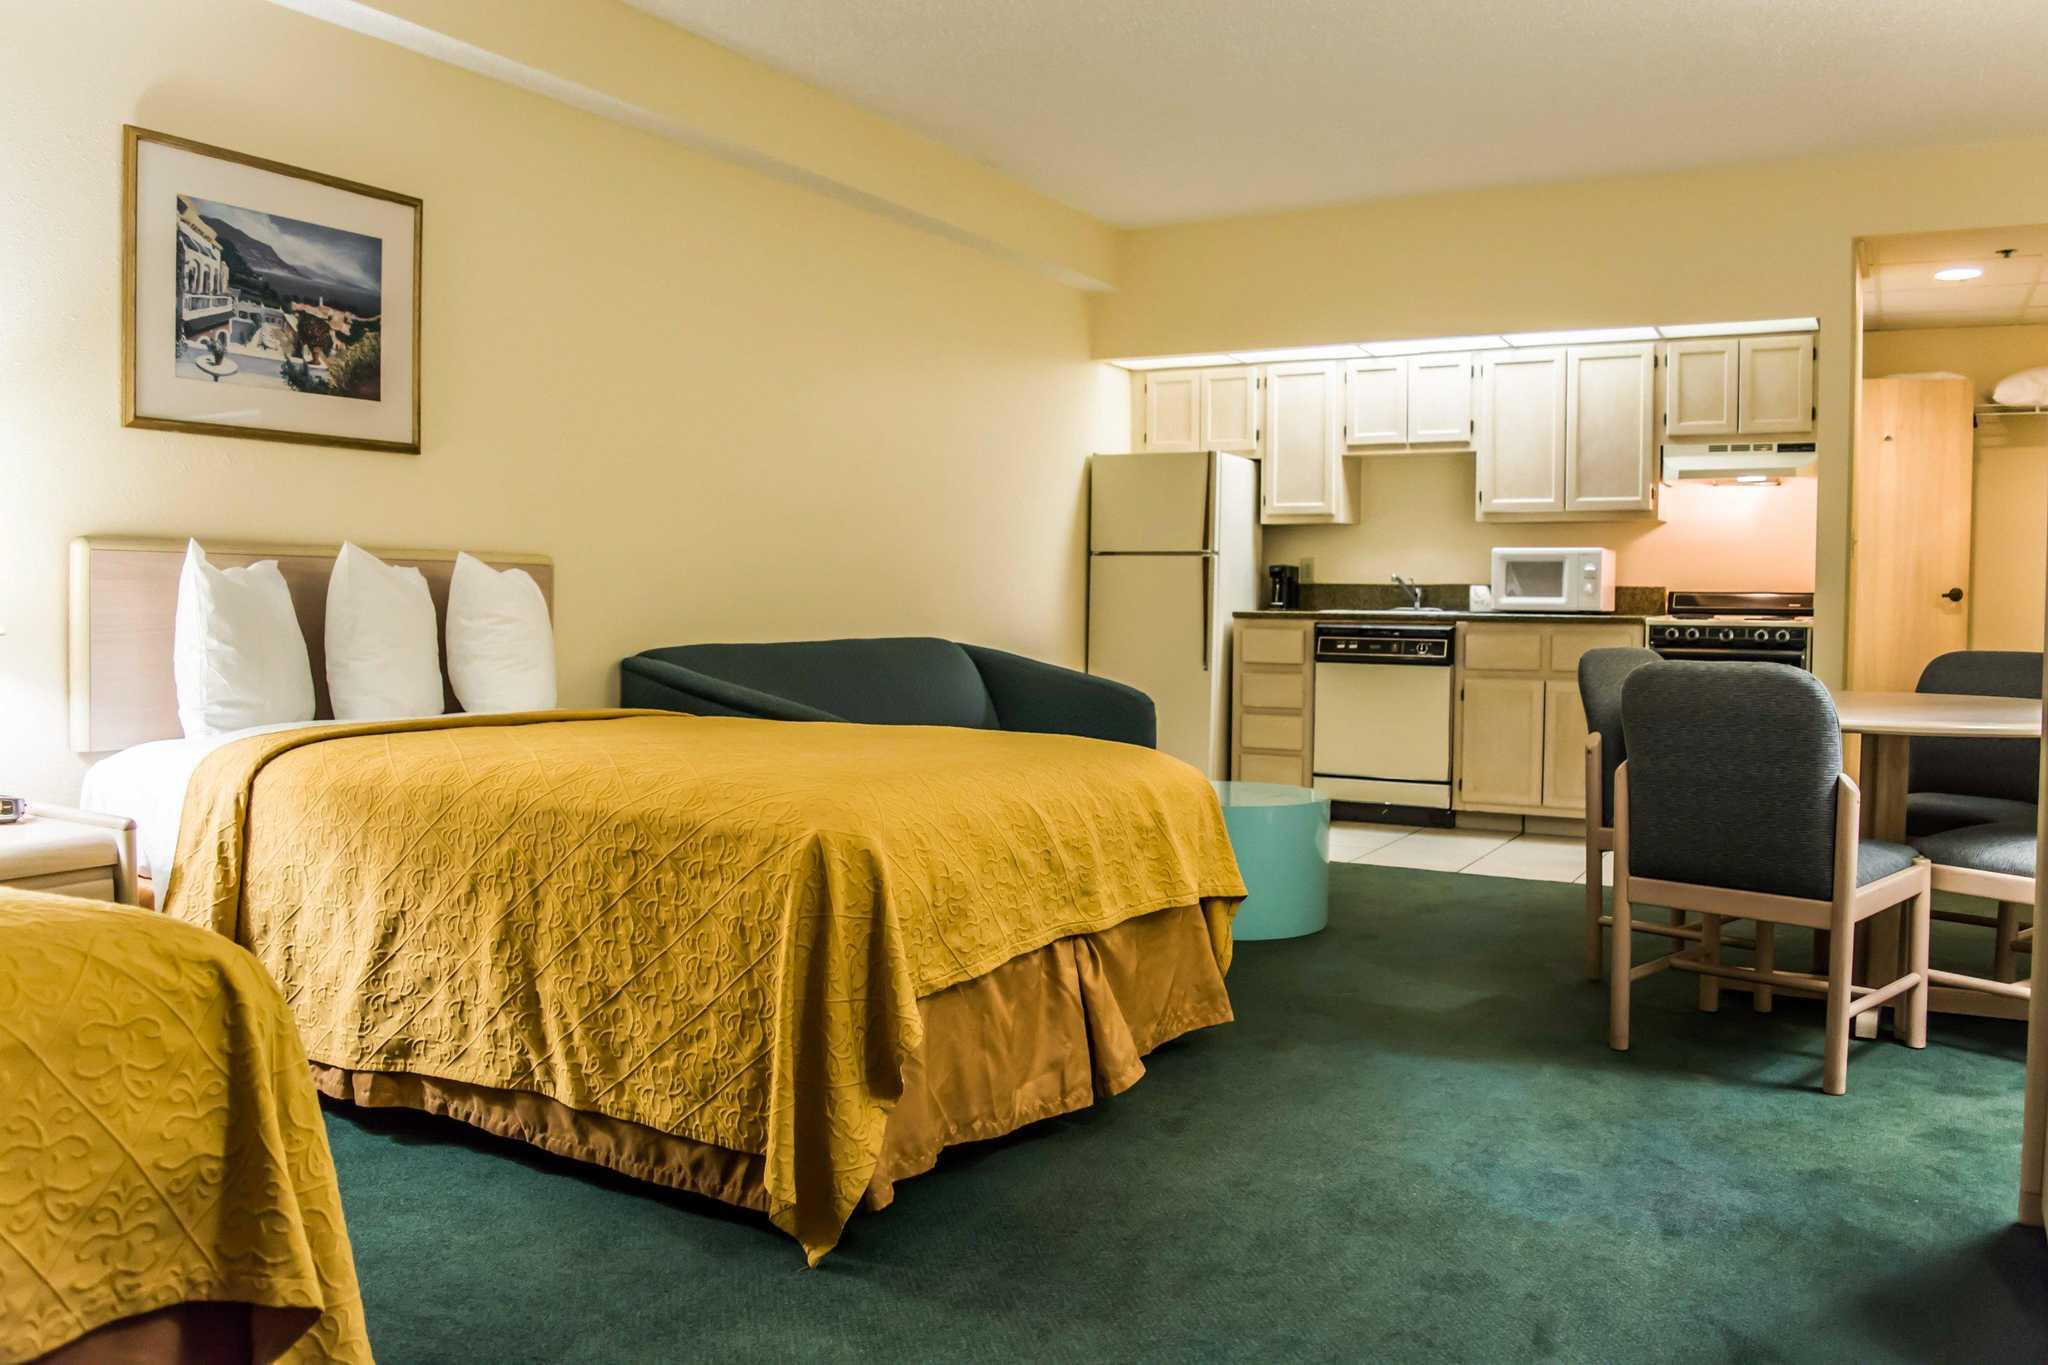 Quality Inn & Suites Golf Resort image 13